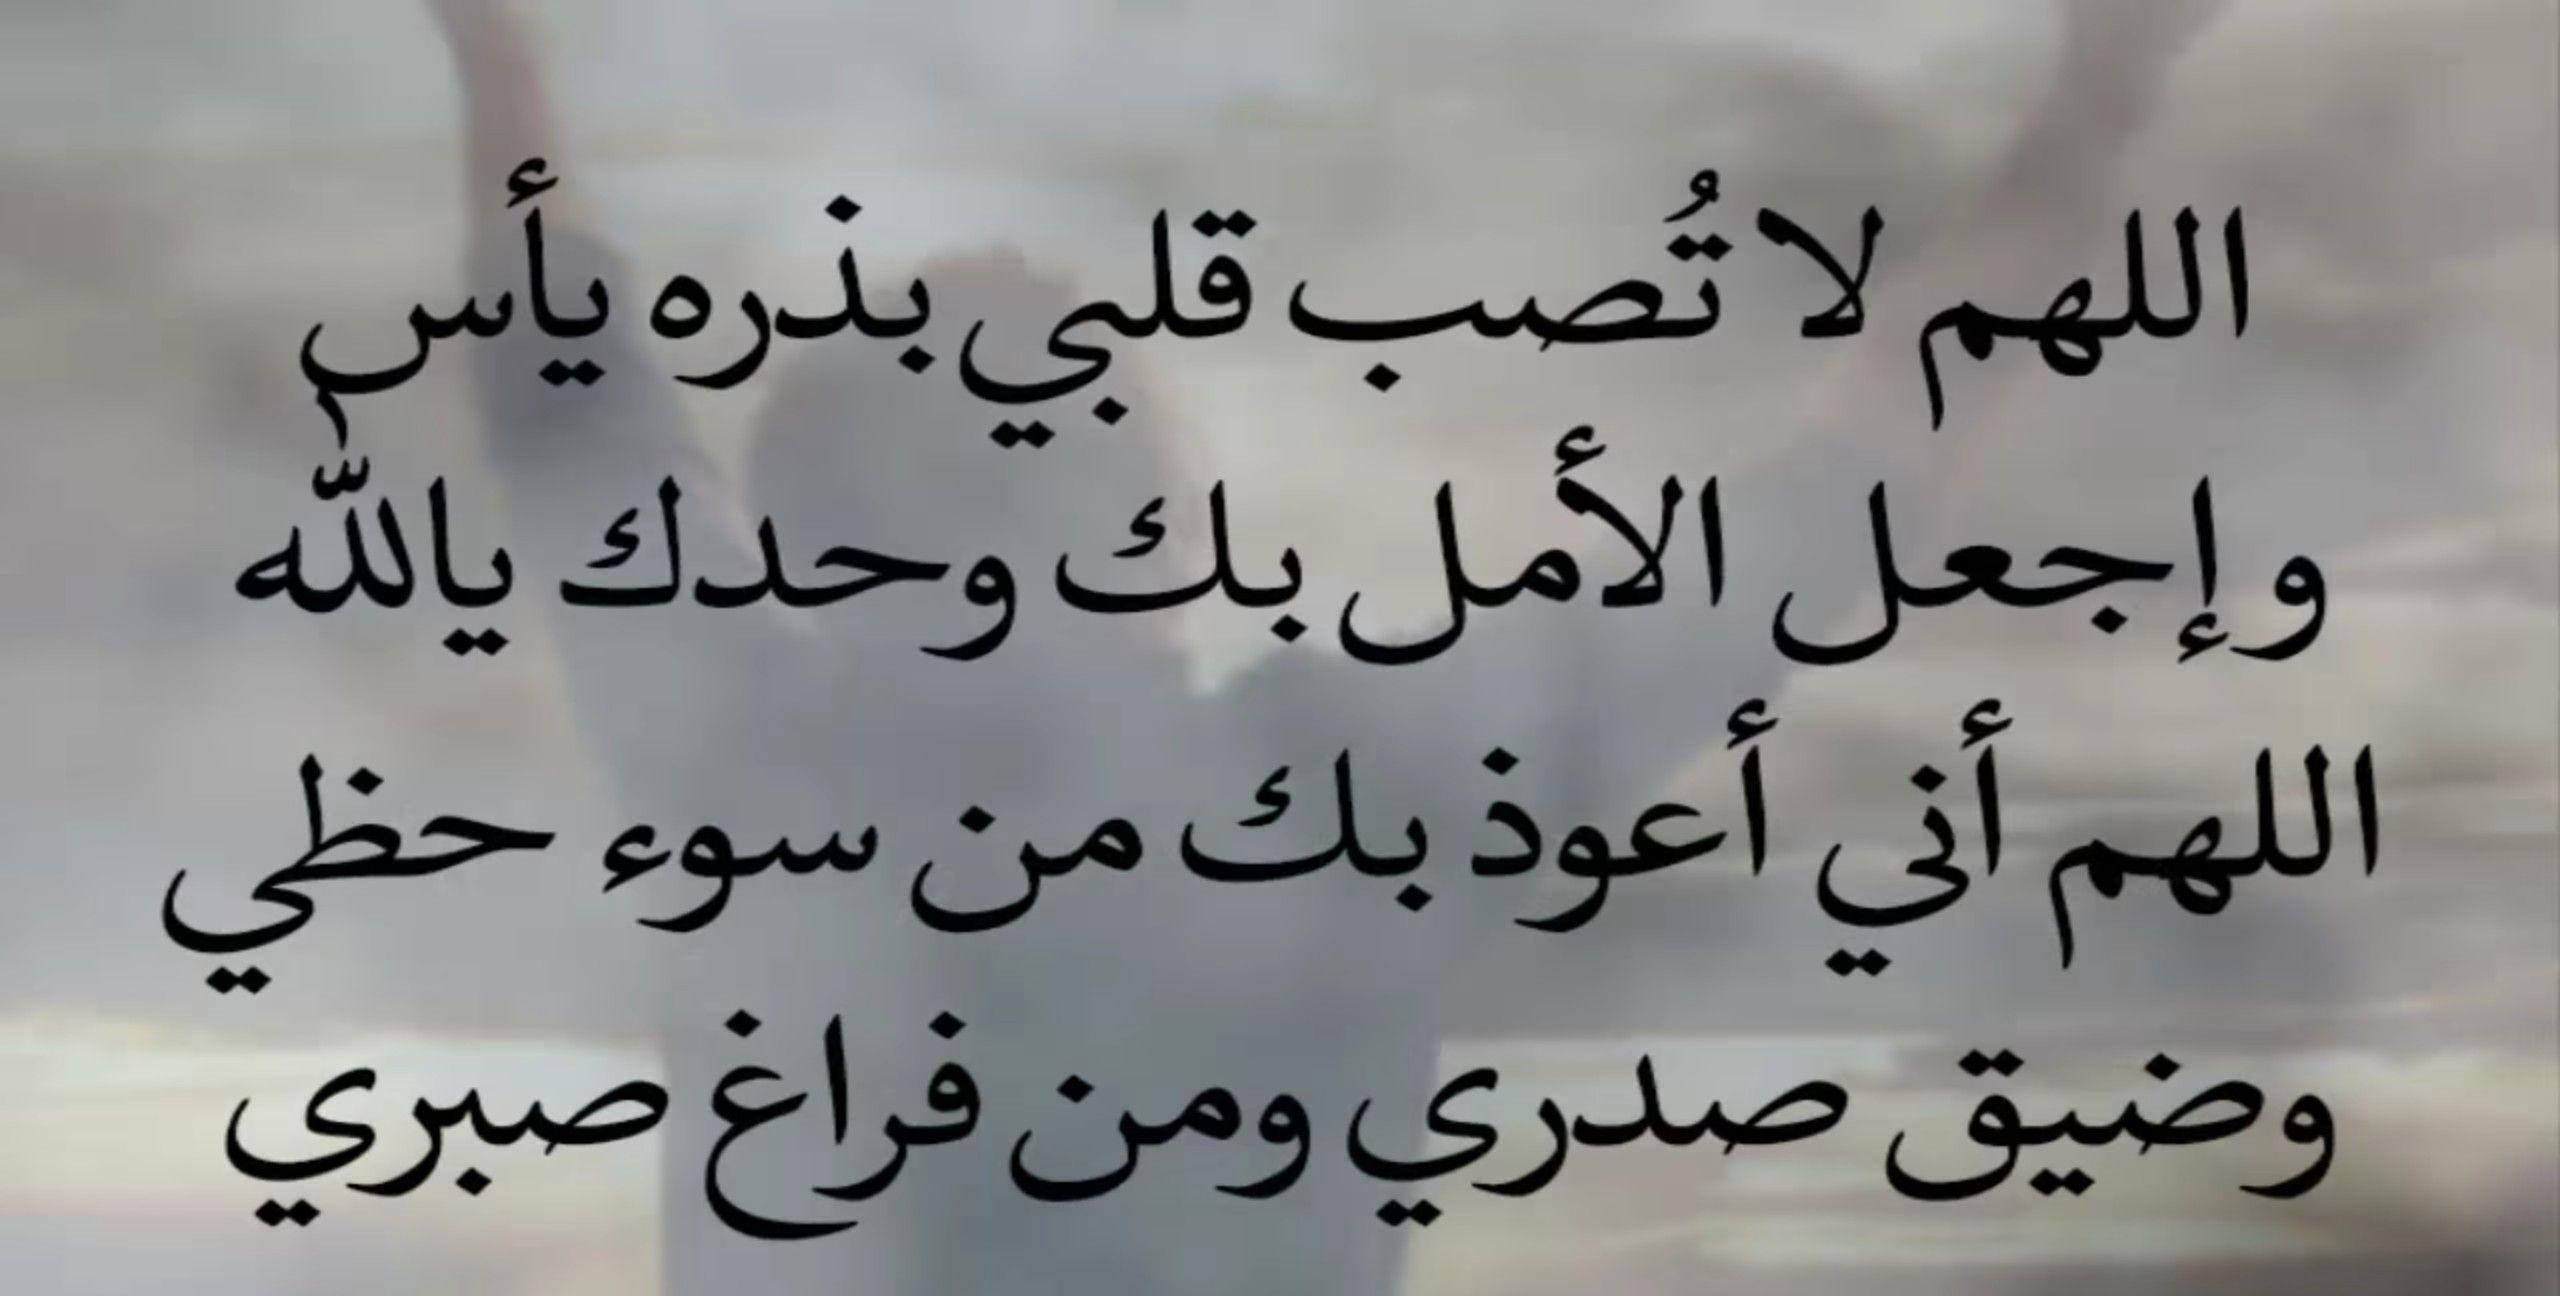 Pin By فلسطينية ولي الفخر On دين ودنيا Calligraphy Arabic Calligraphy Math